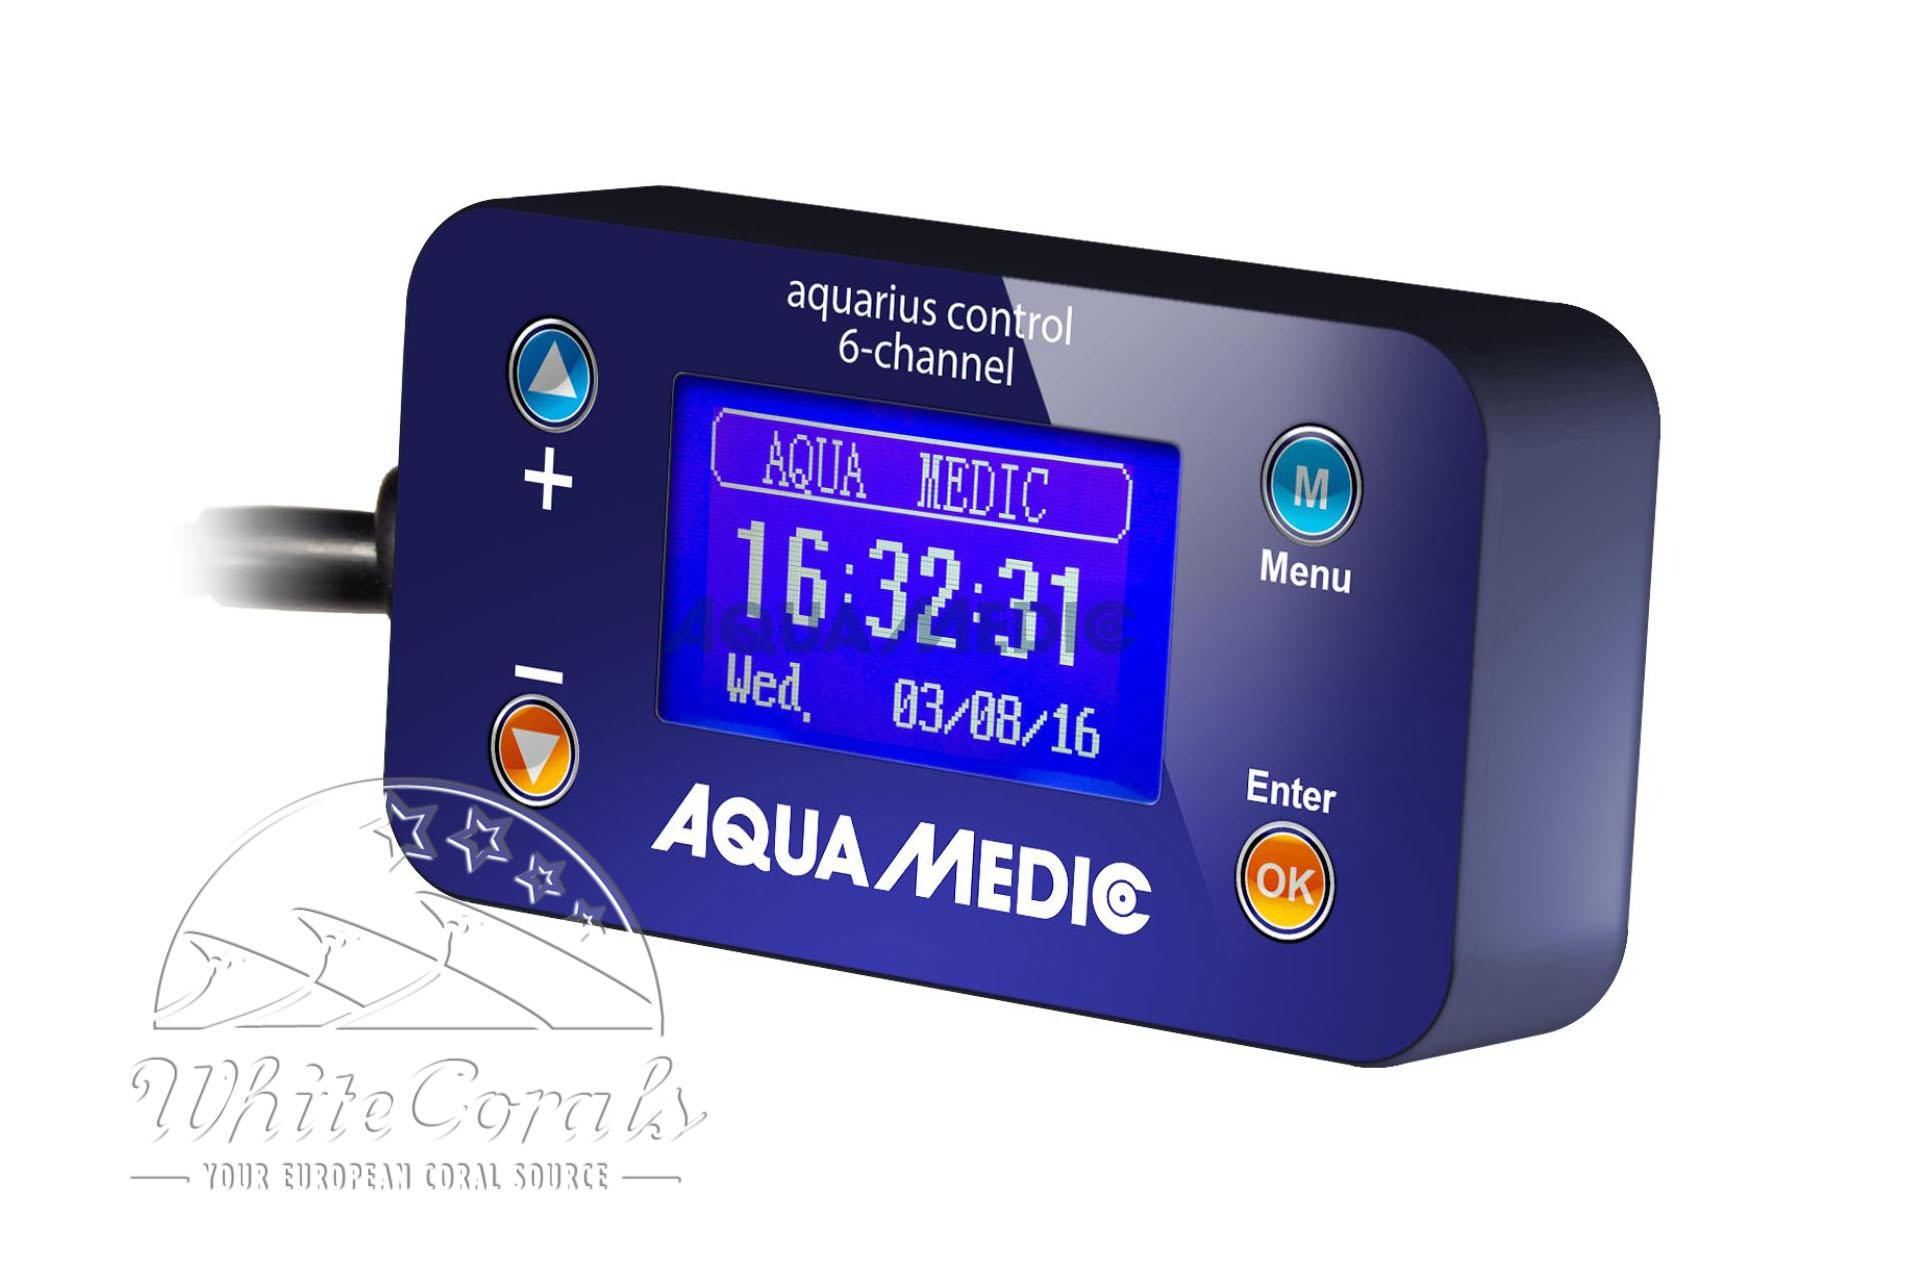 Aqua Medic aquarius control Lichtsteuerung